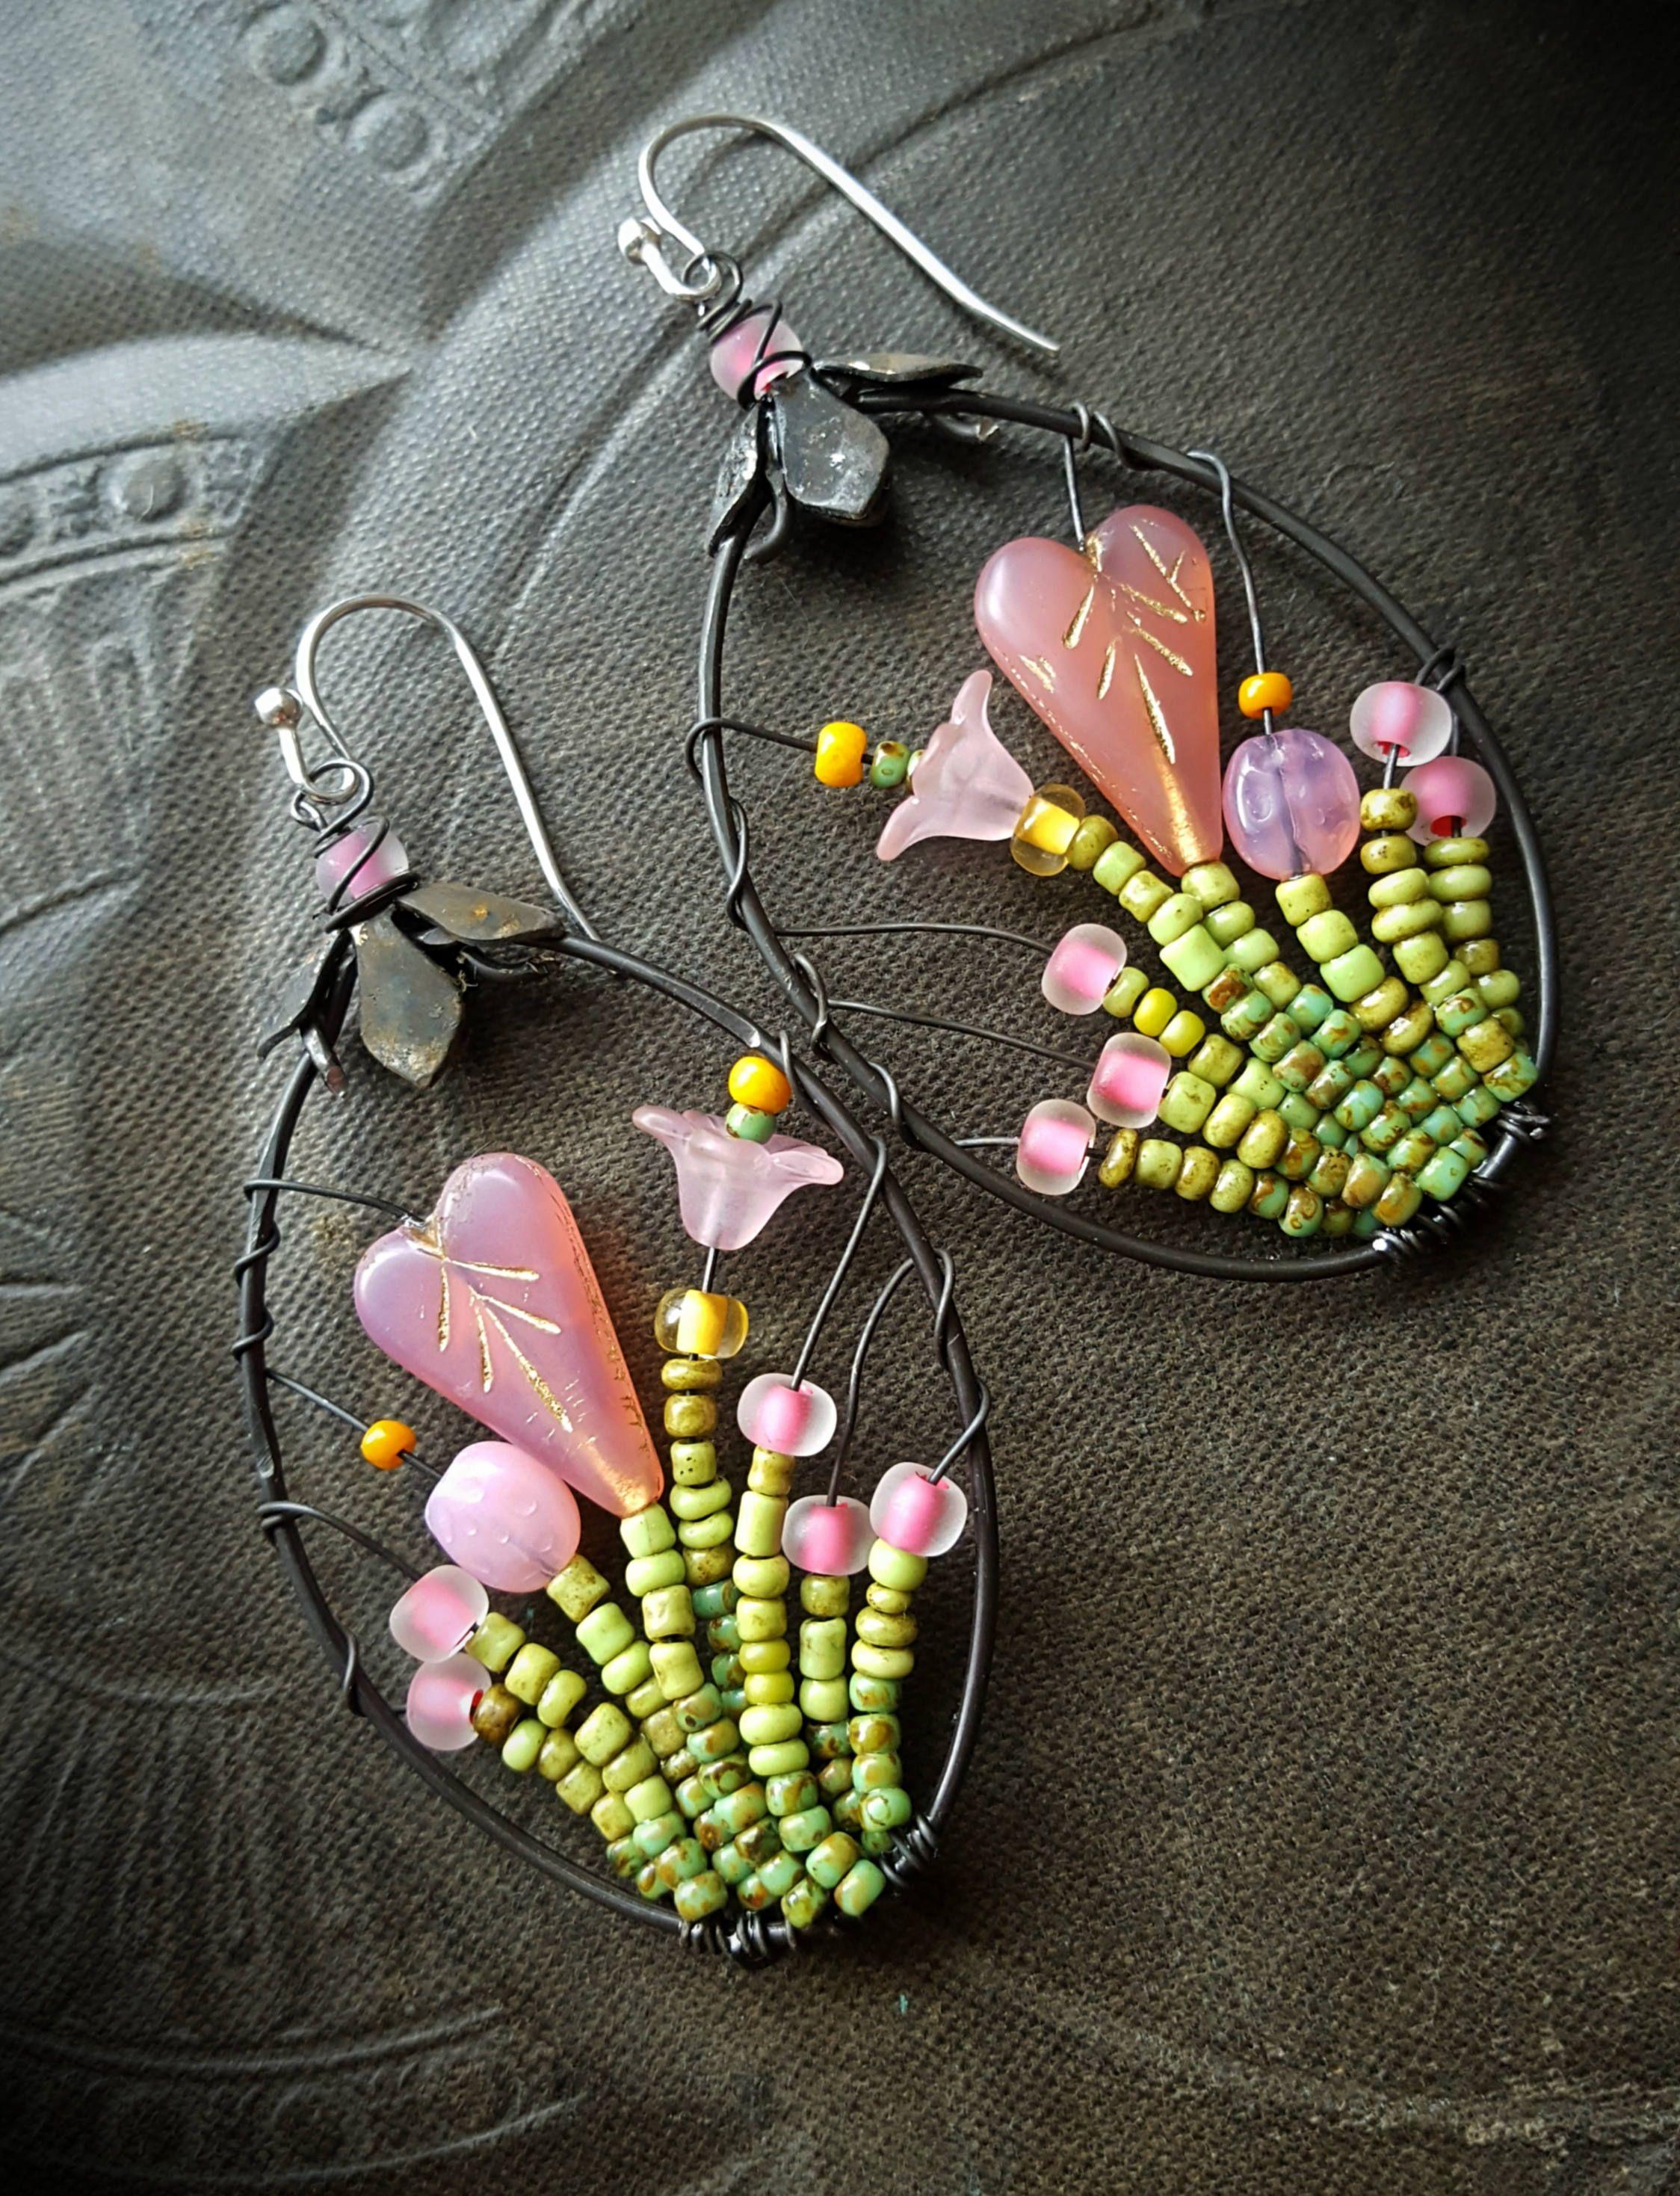 Blossom Series, Flowers, Hearts, Mothers Day, Garden, Artisan Made, Hoops,  Glass Flower Earrings, Unique, Organic, Beaded Earrings